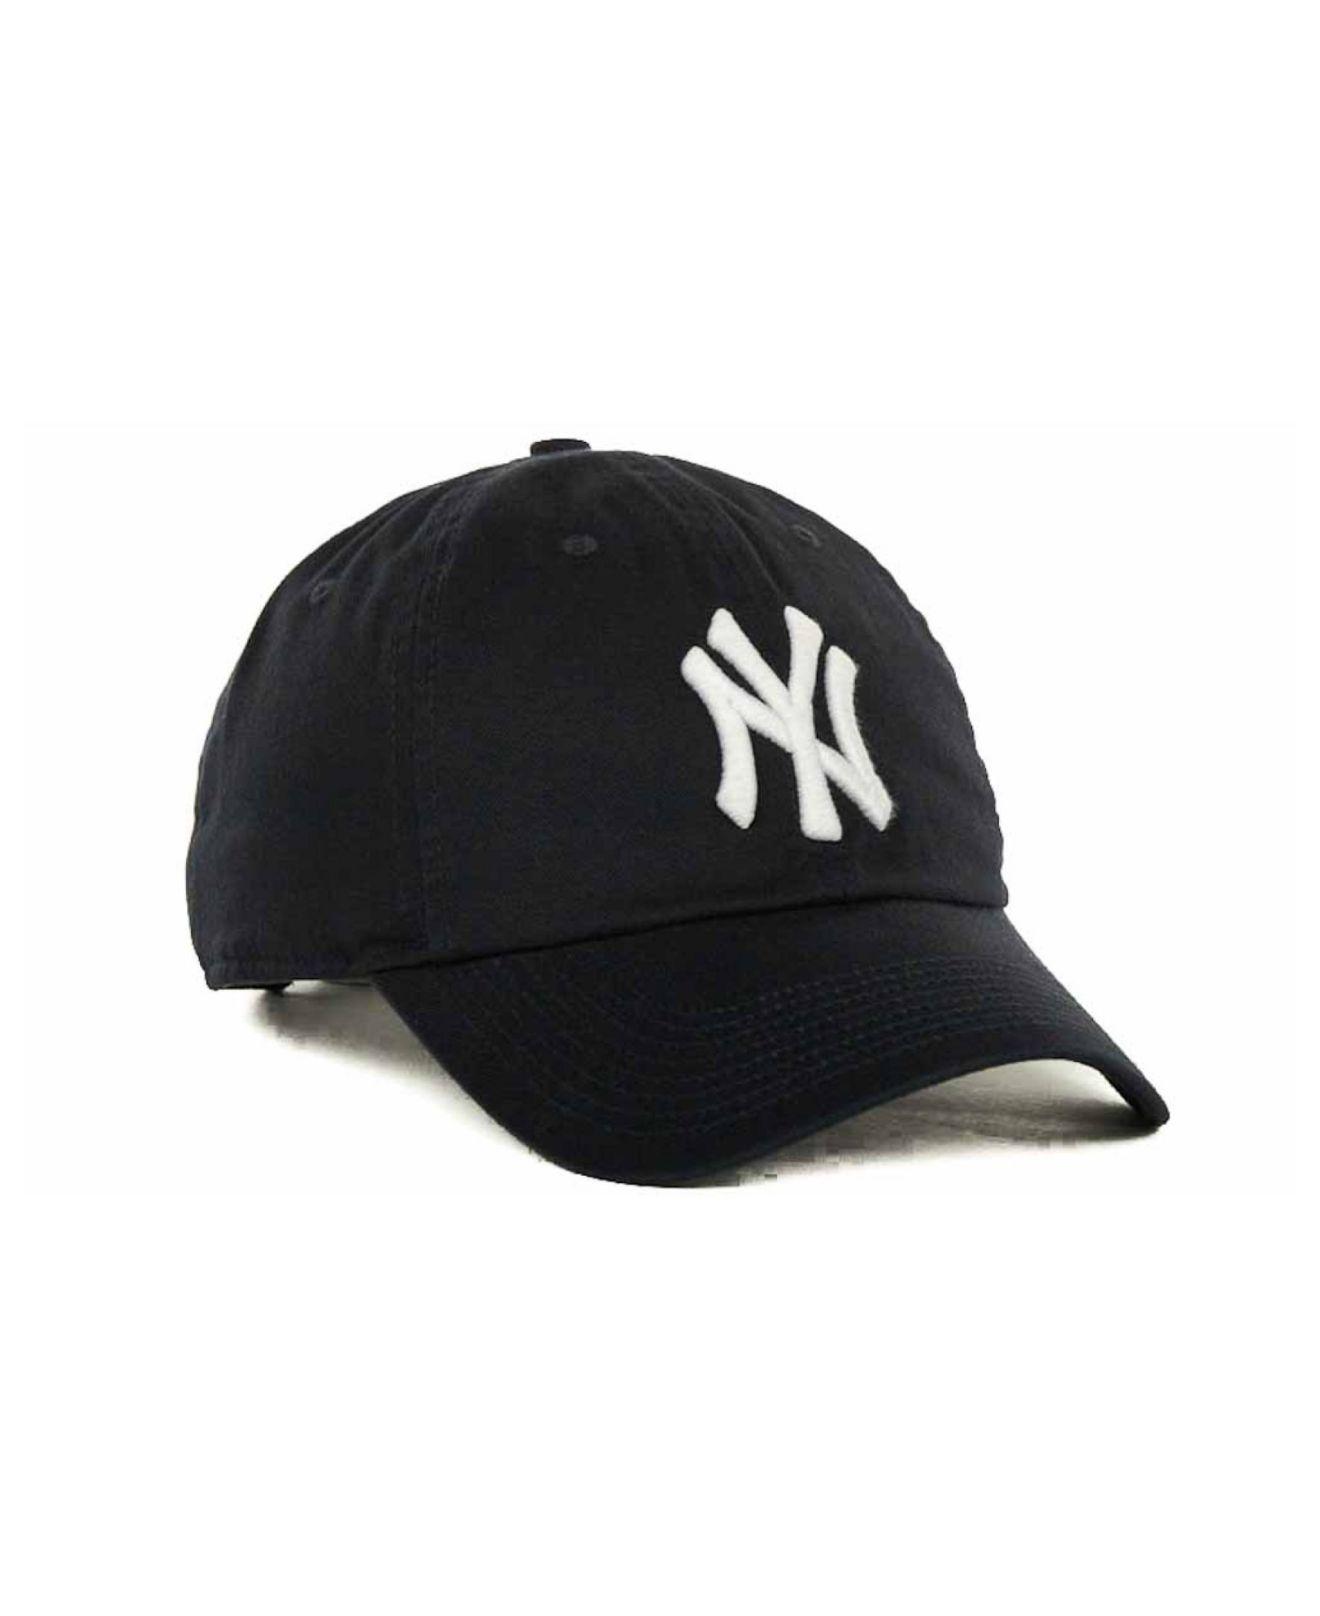 e10390110d6ff9 ... promo code for lyst nike womens new york yankees stadium cap in blue  57fee f1d3c ...